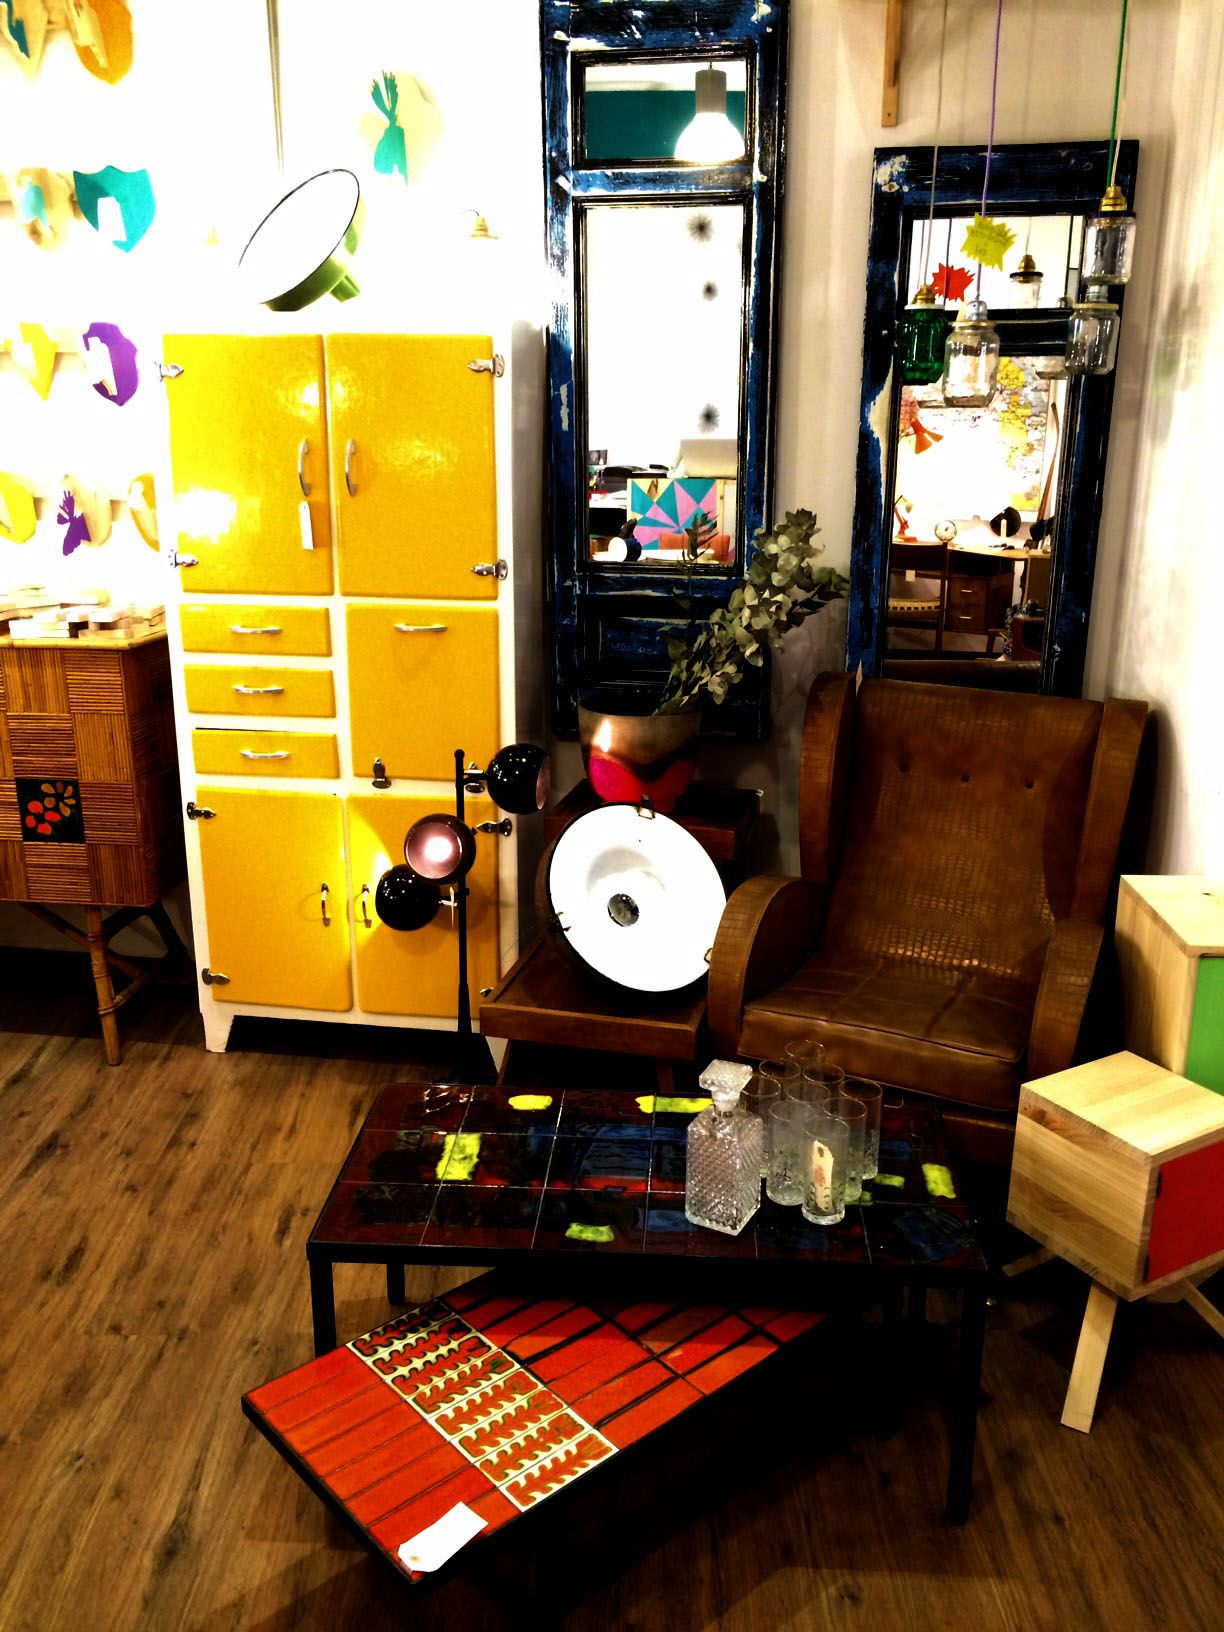 Alacenas lakari kala alacenas alacena retro vintage - Venta de muebles vintage ...